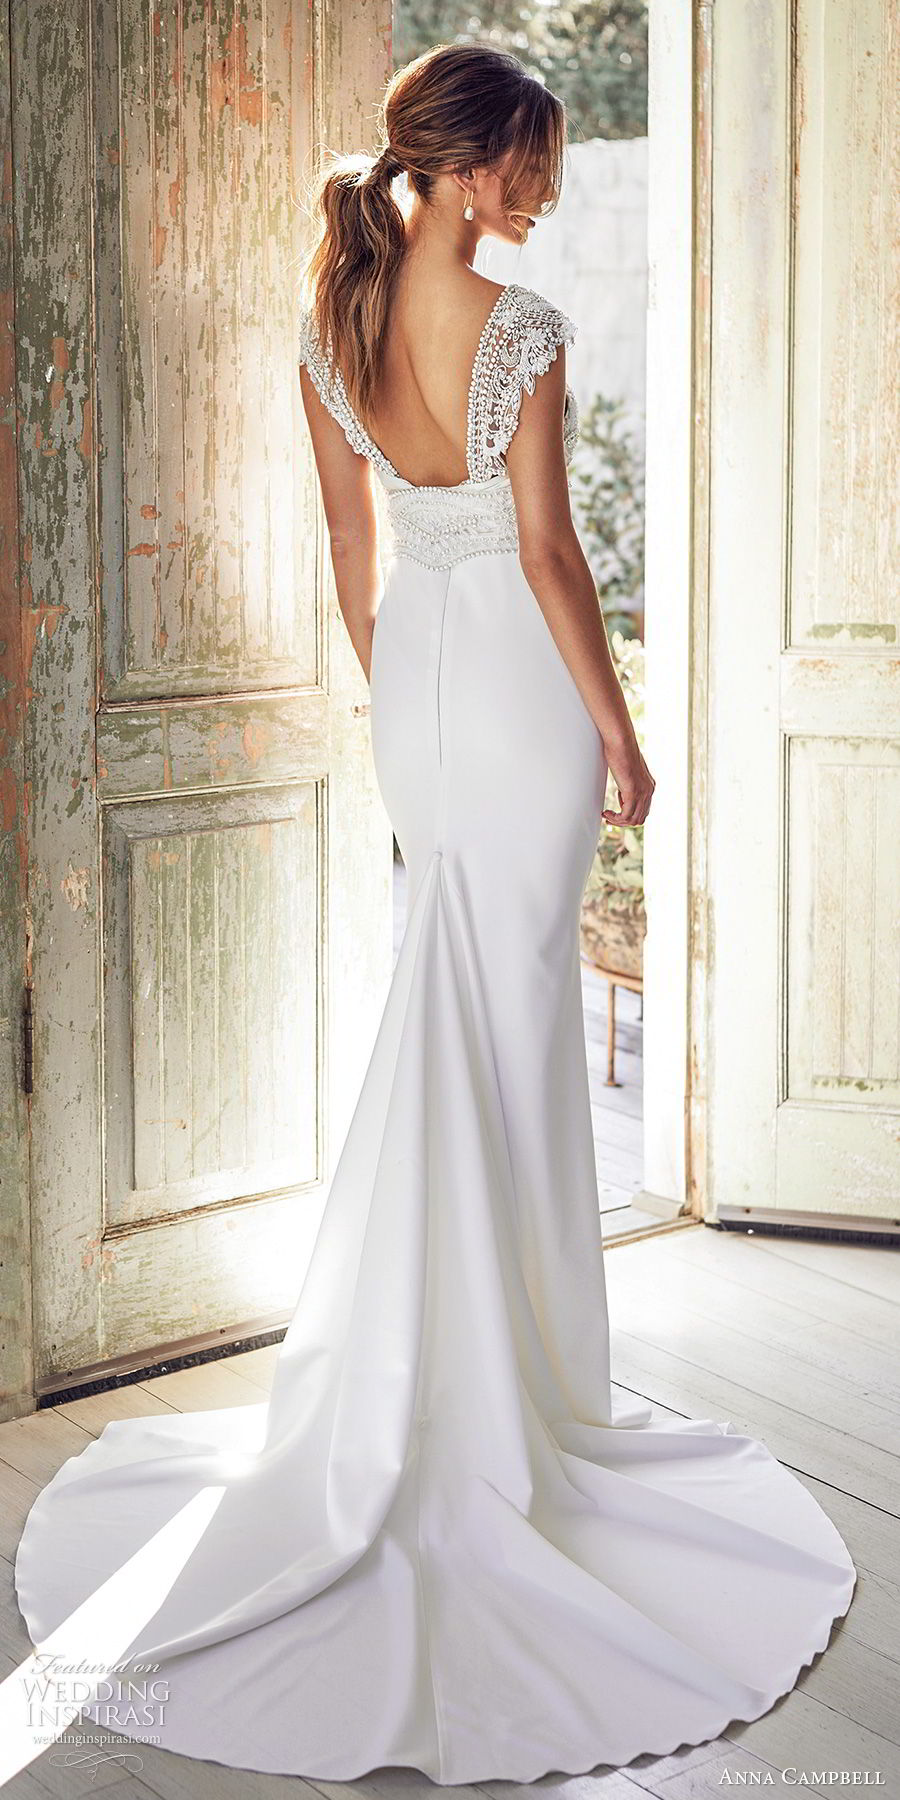 anna campbell 2020 bridal cap sleeves  deep v neckline heavily embellished bodice clean skirt sheath wedding dress (12) elegant glam square back chapel train bv